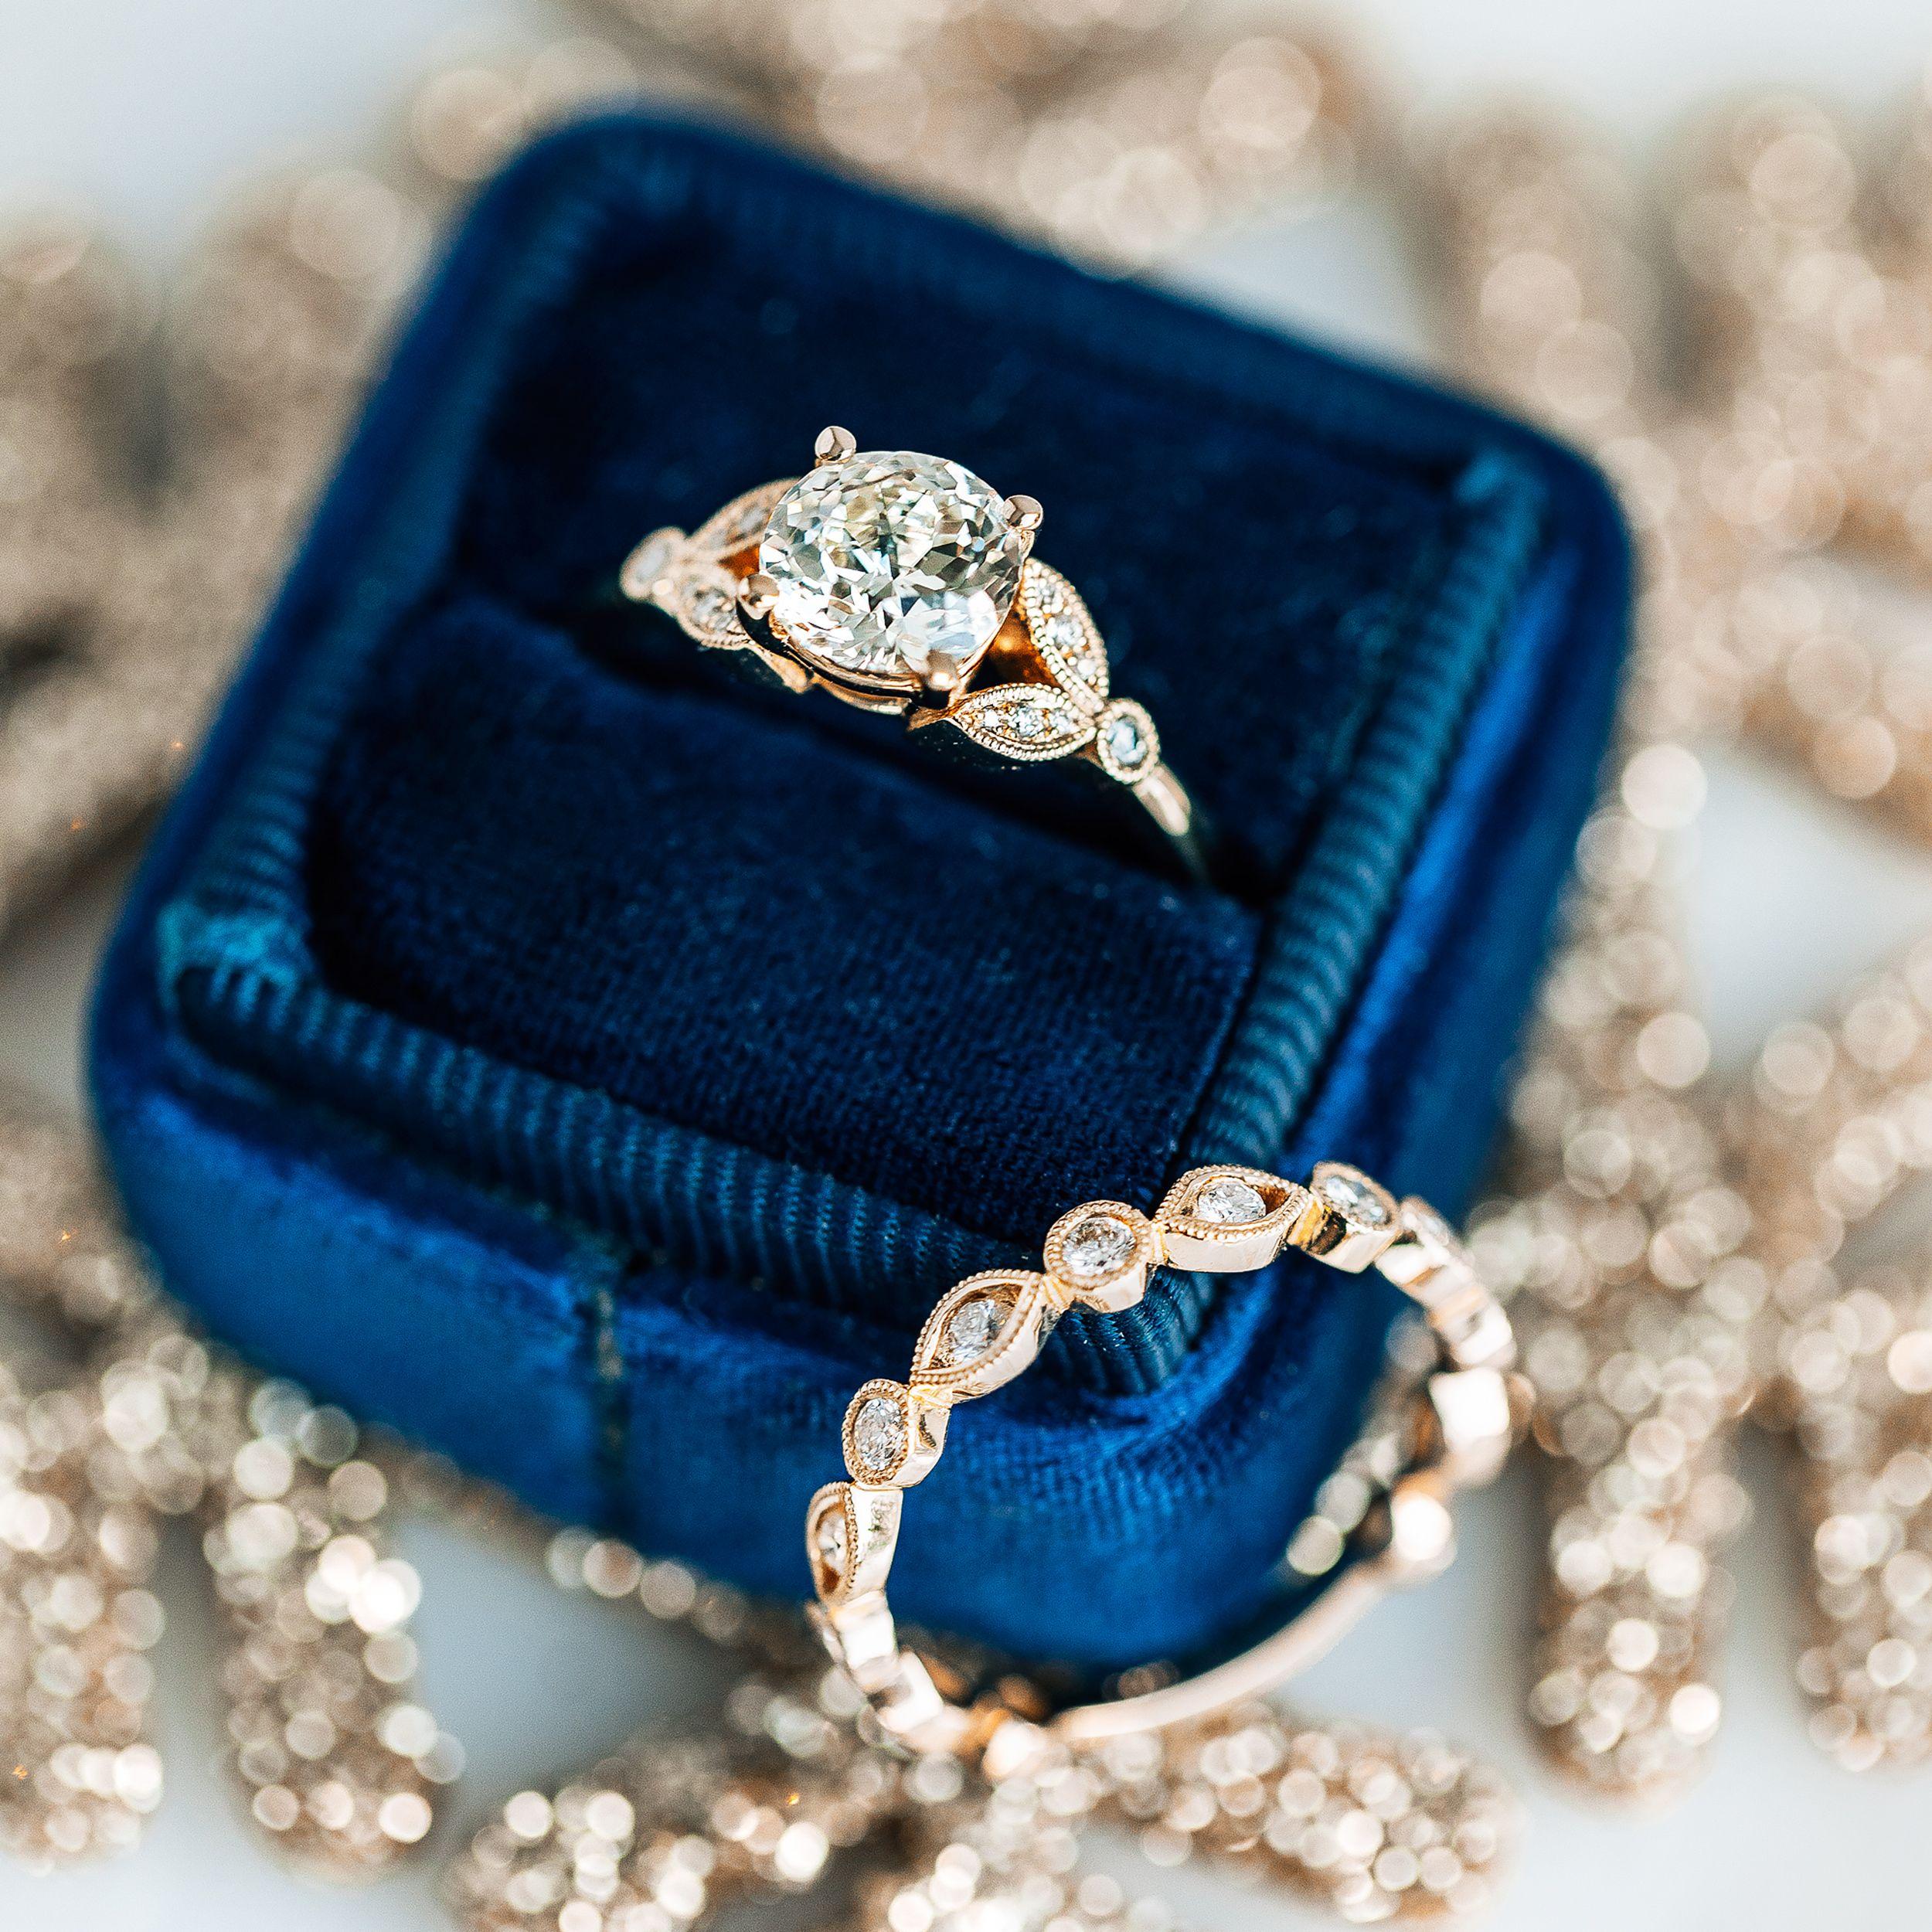 Stunning Crown Jubilee Diamond Engagement Ring Set In 18k Yellow